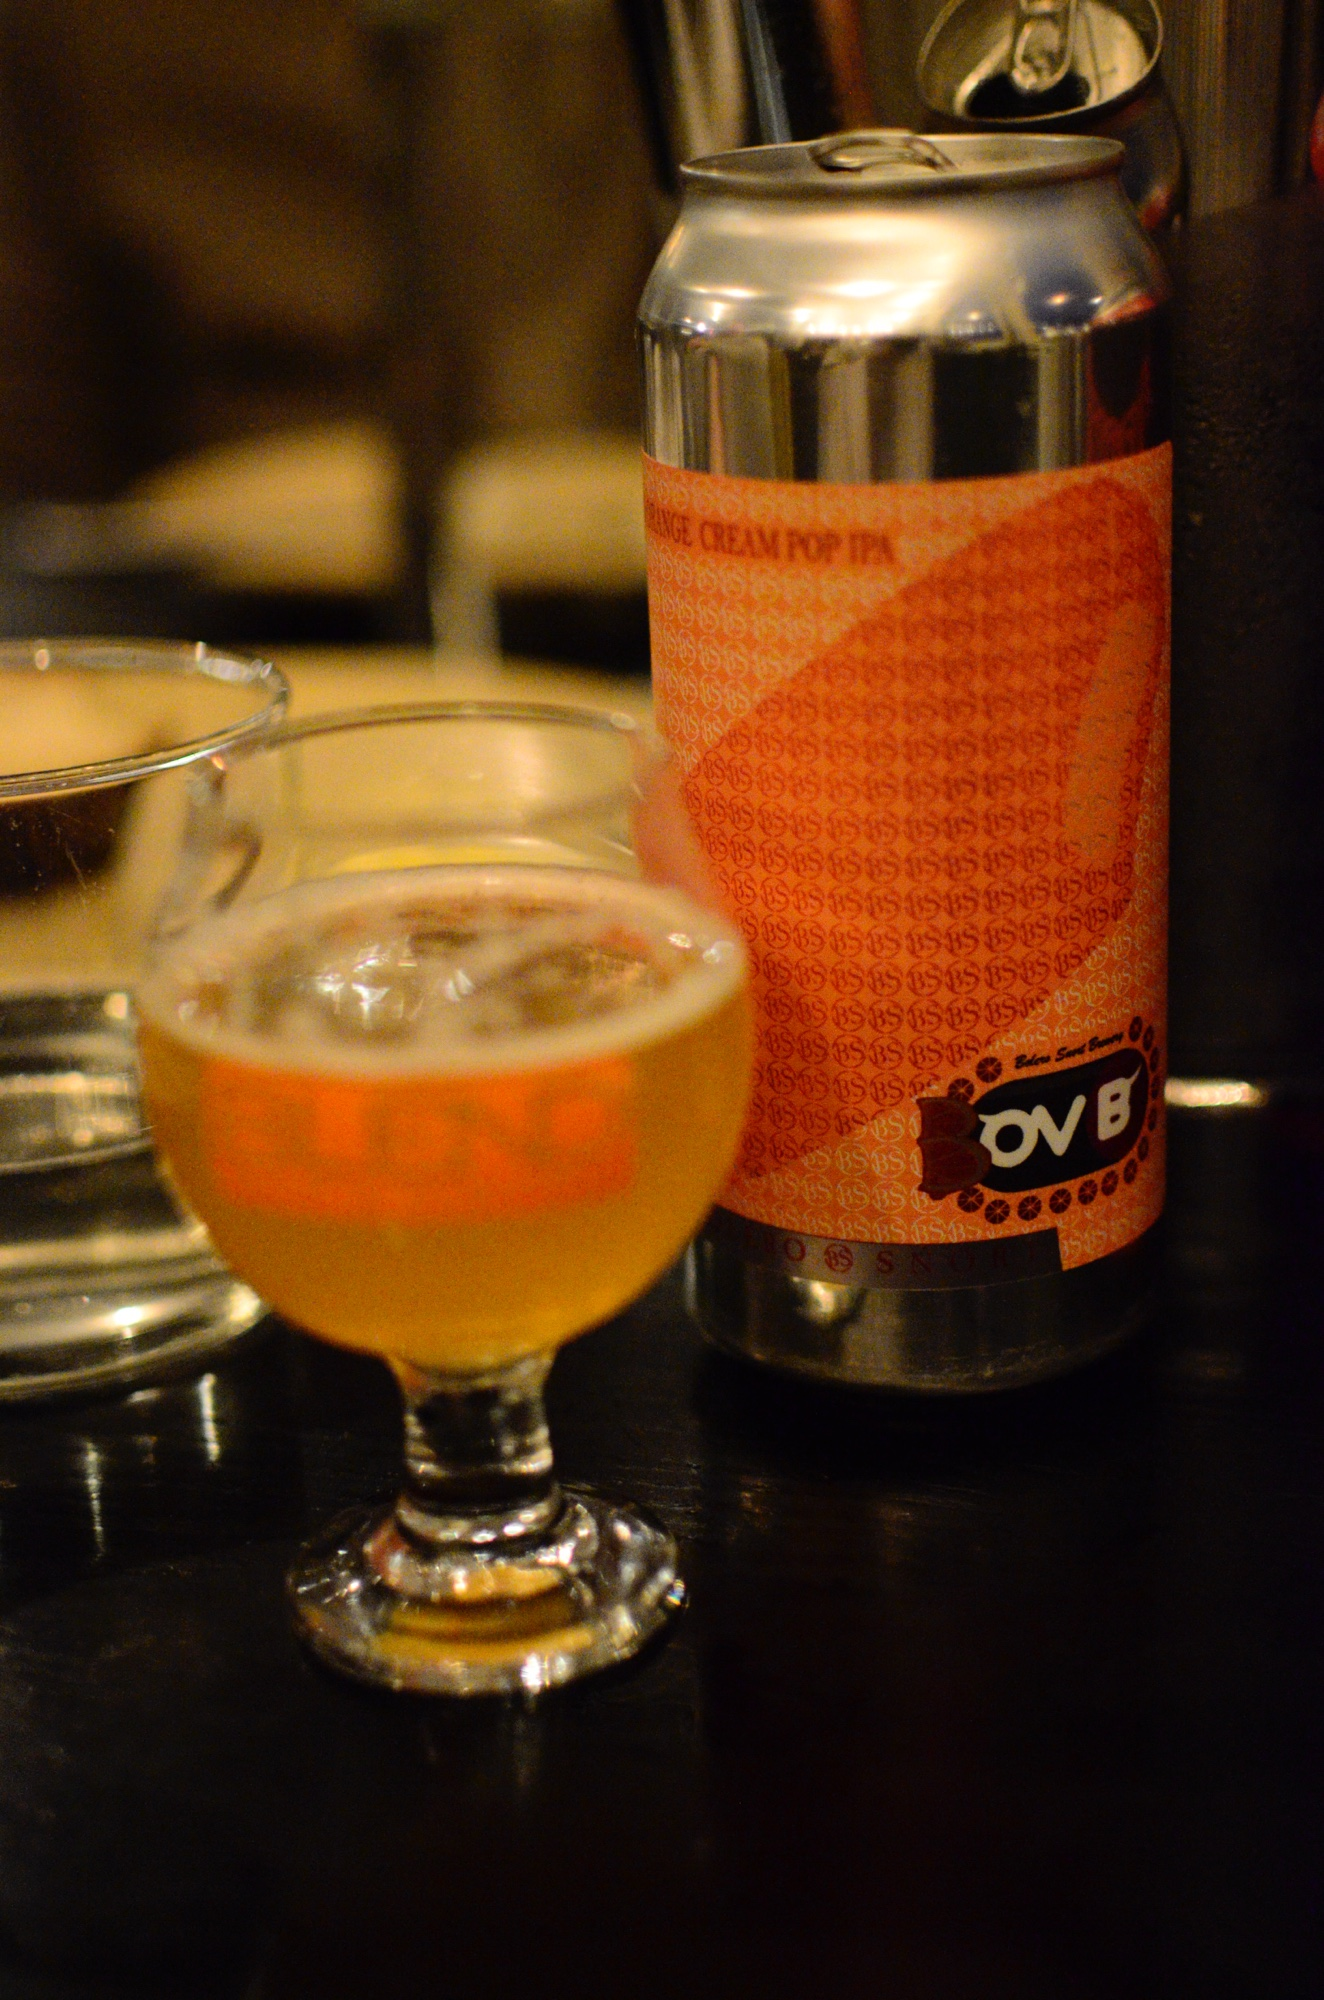 BOVB (Blood Orange Cream Pop IPA)